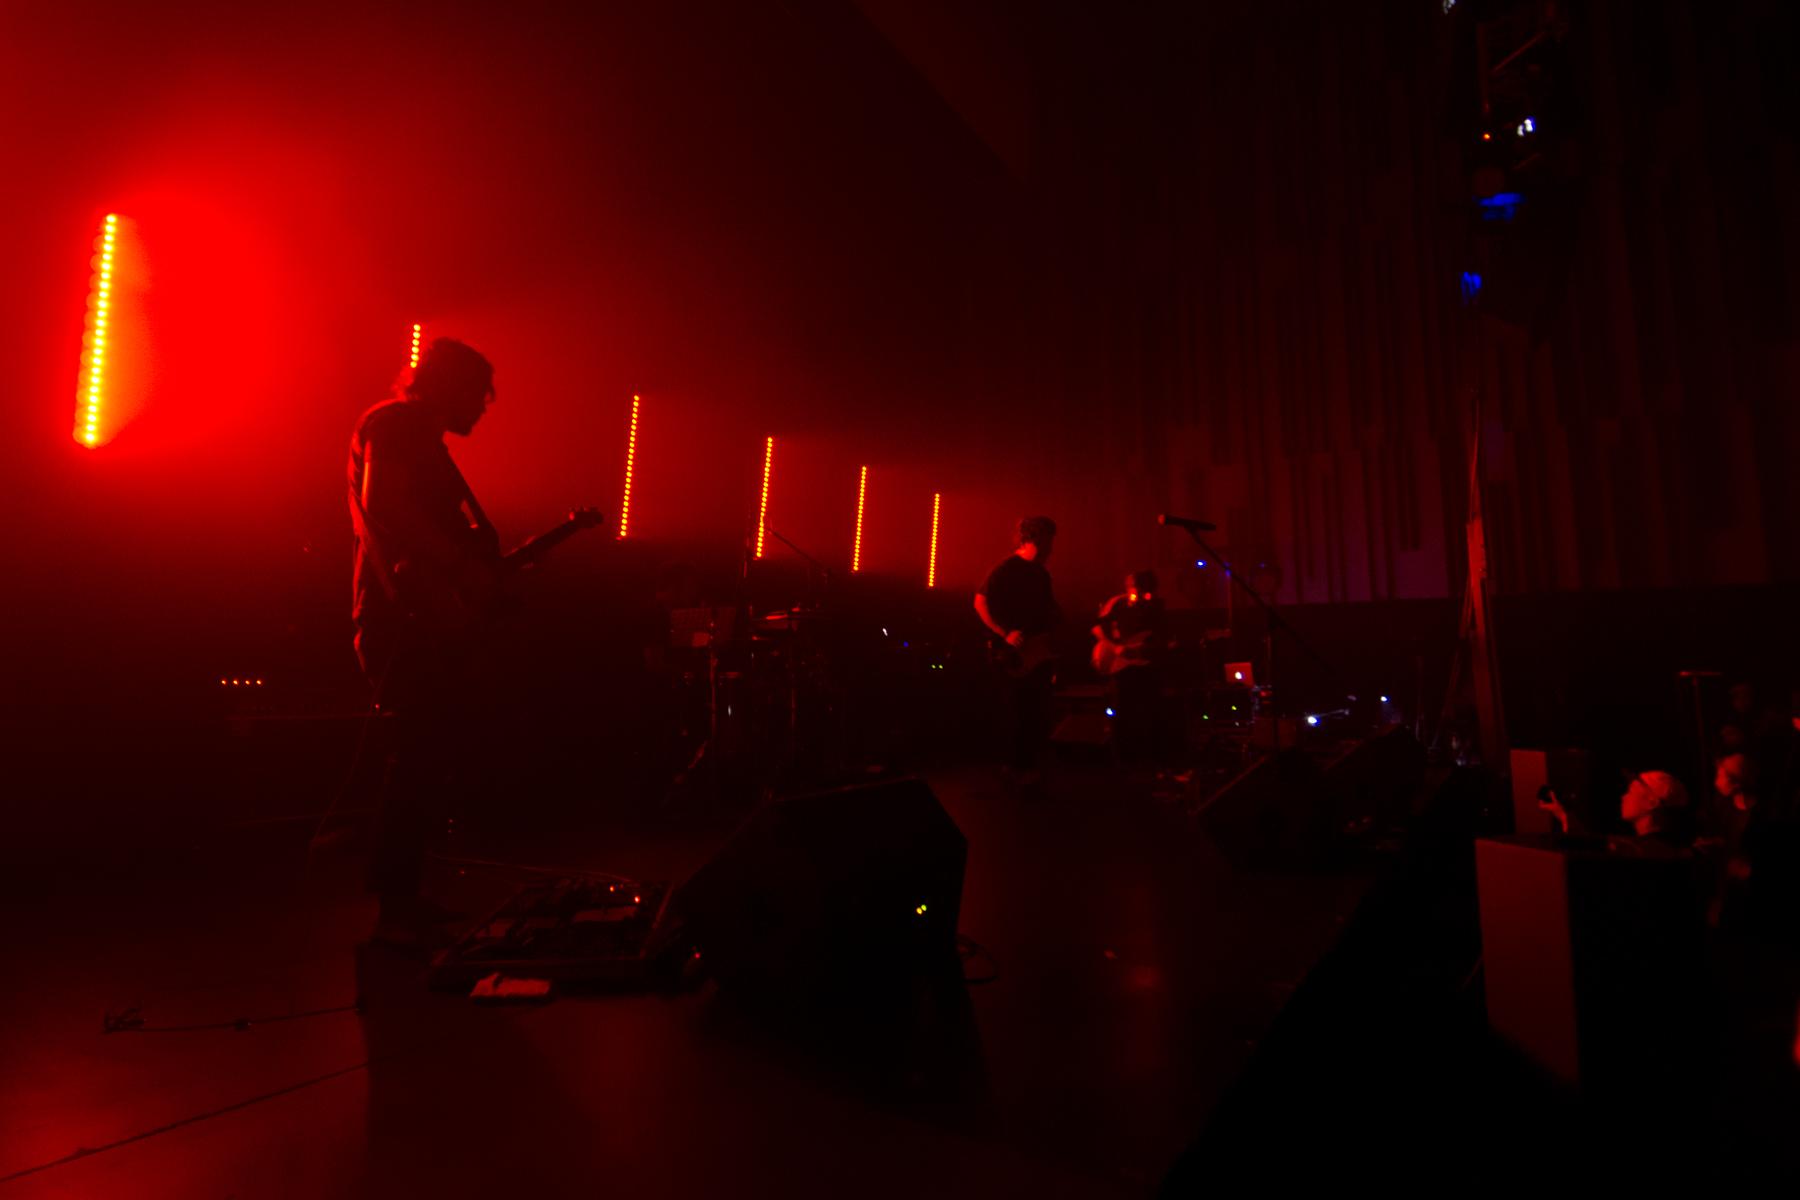 Deepset - Live at Buka Panggung, 19/1/2019